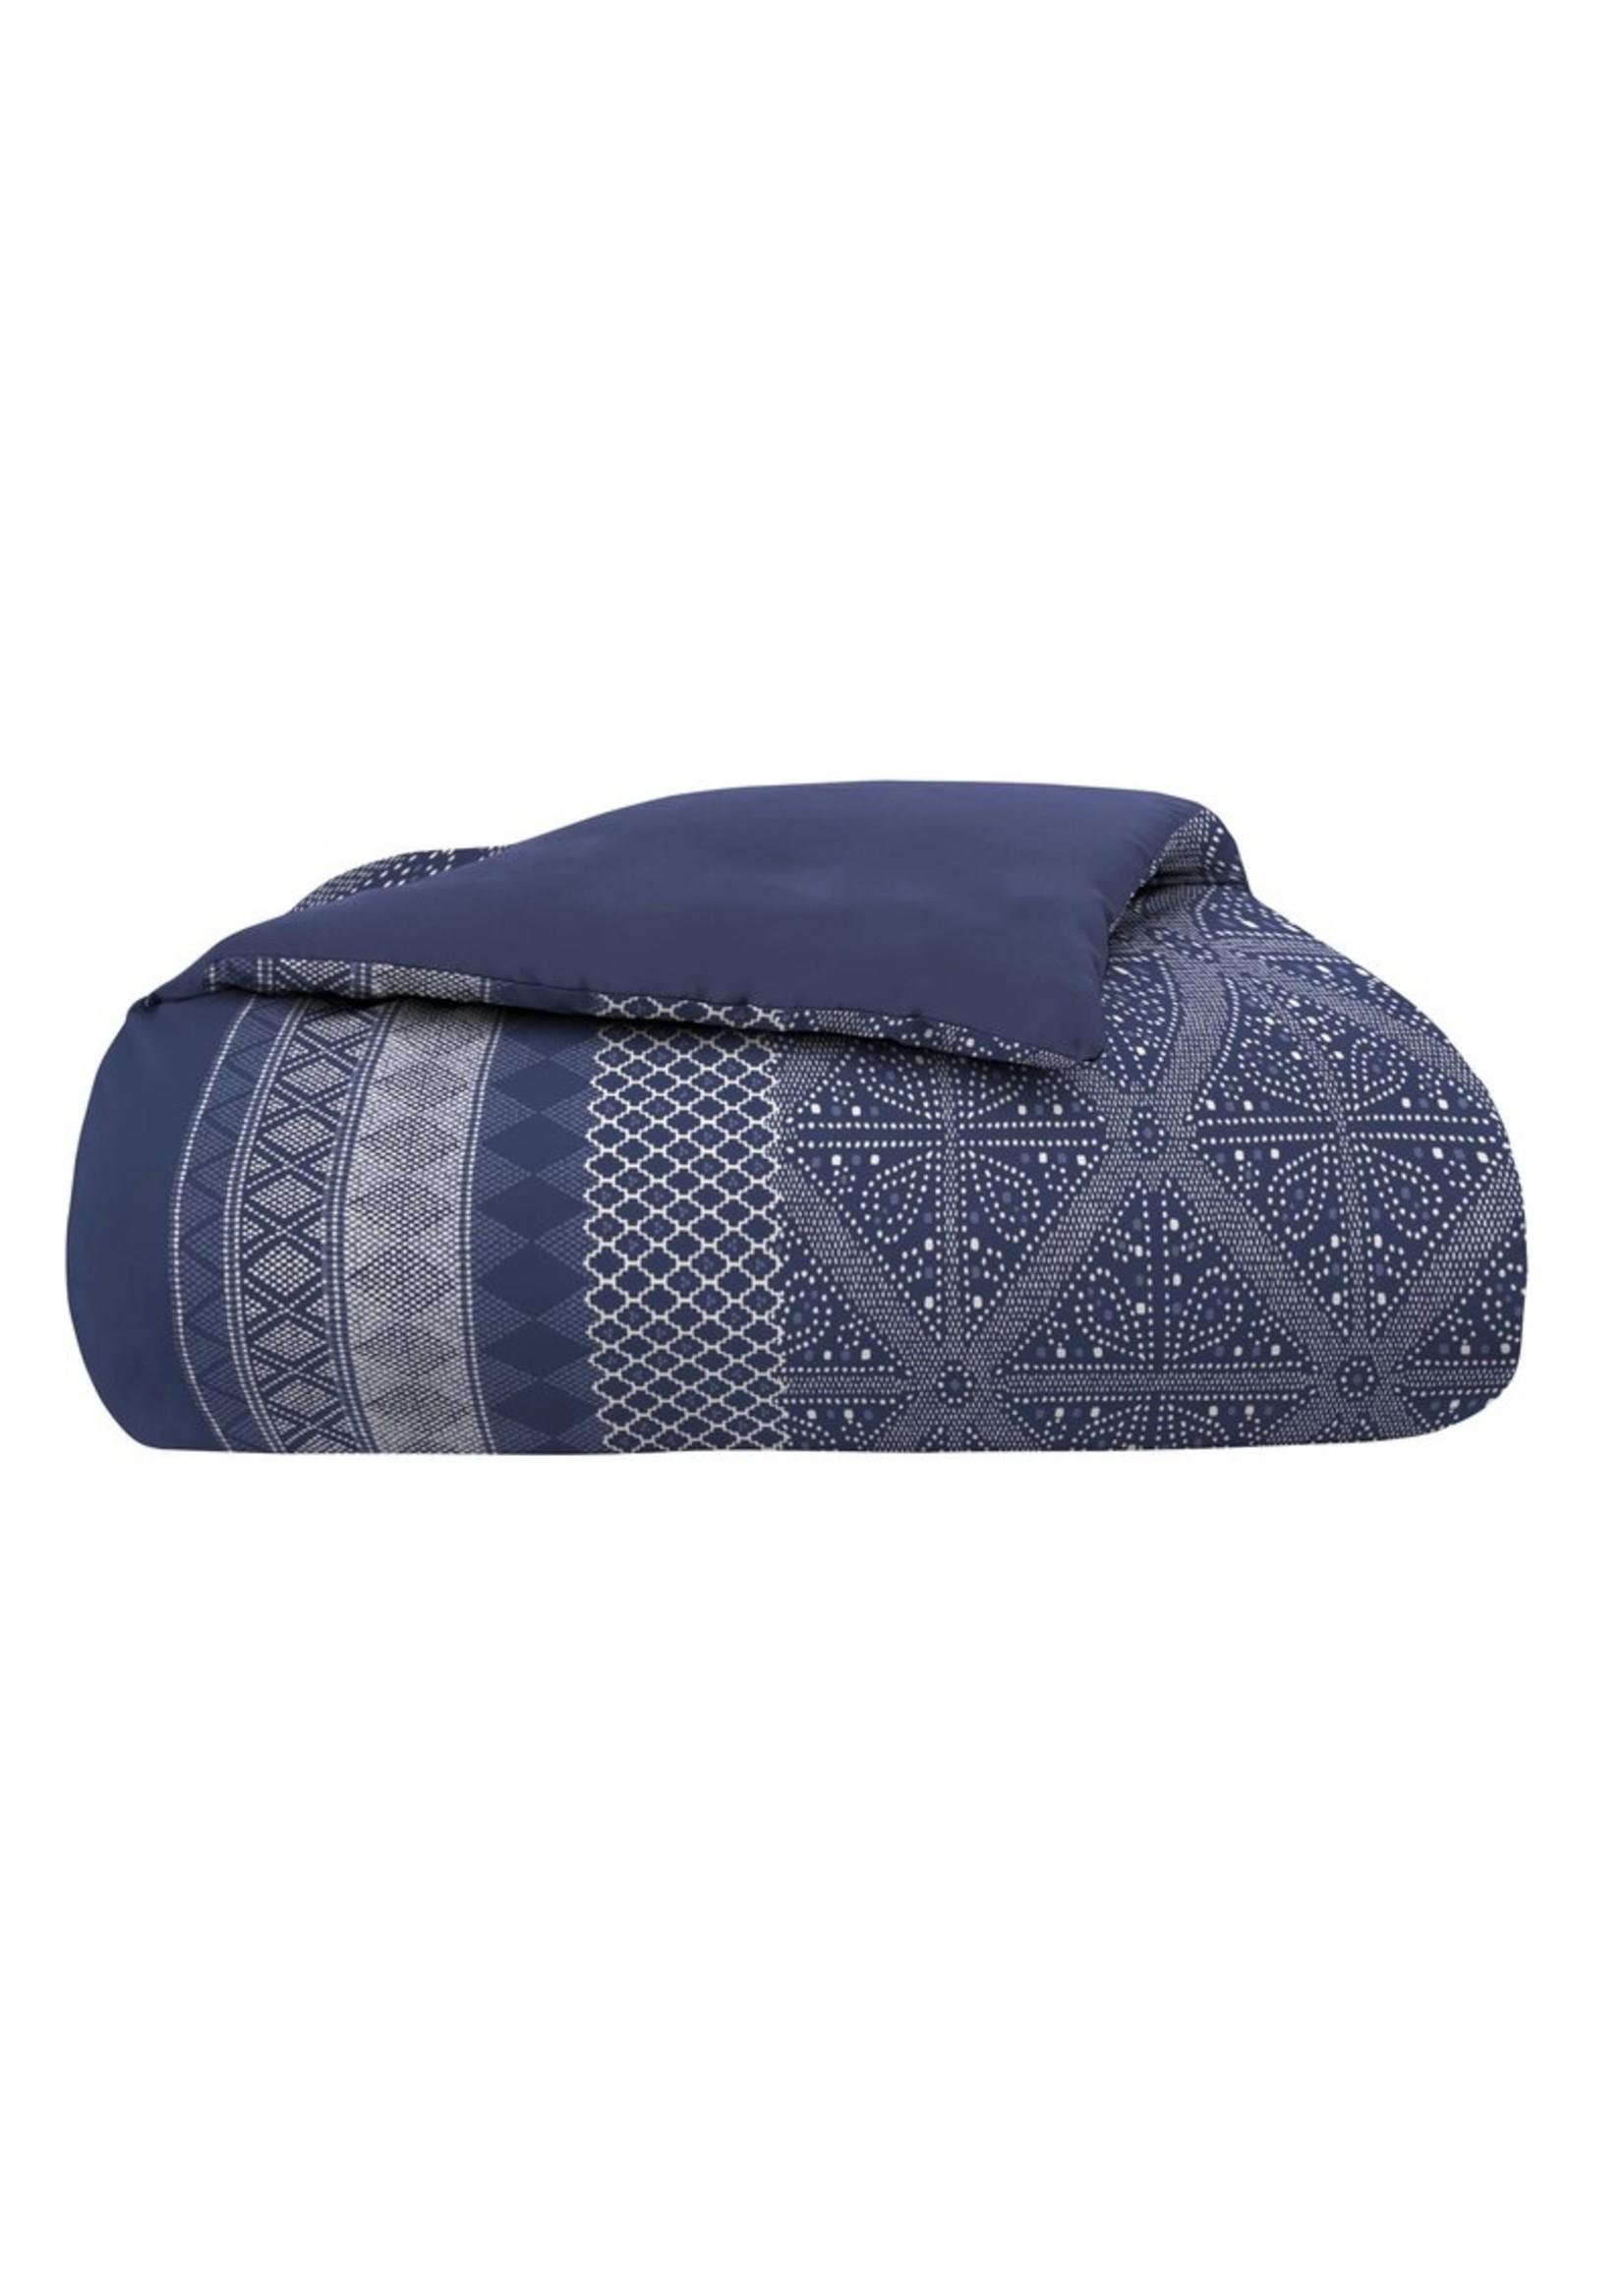 *King - Southern Tide Ocean Gate Comforter Set - Final Sale